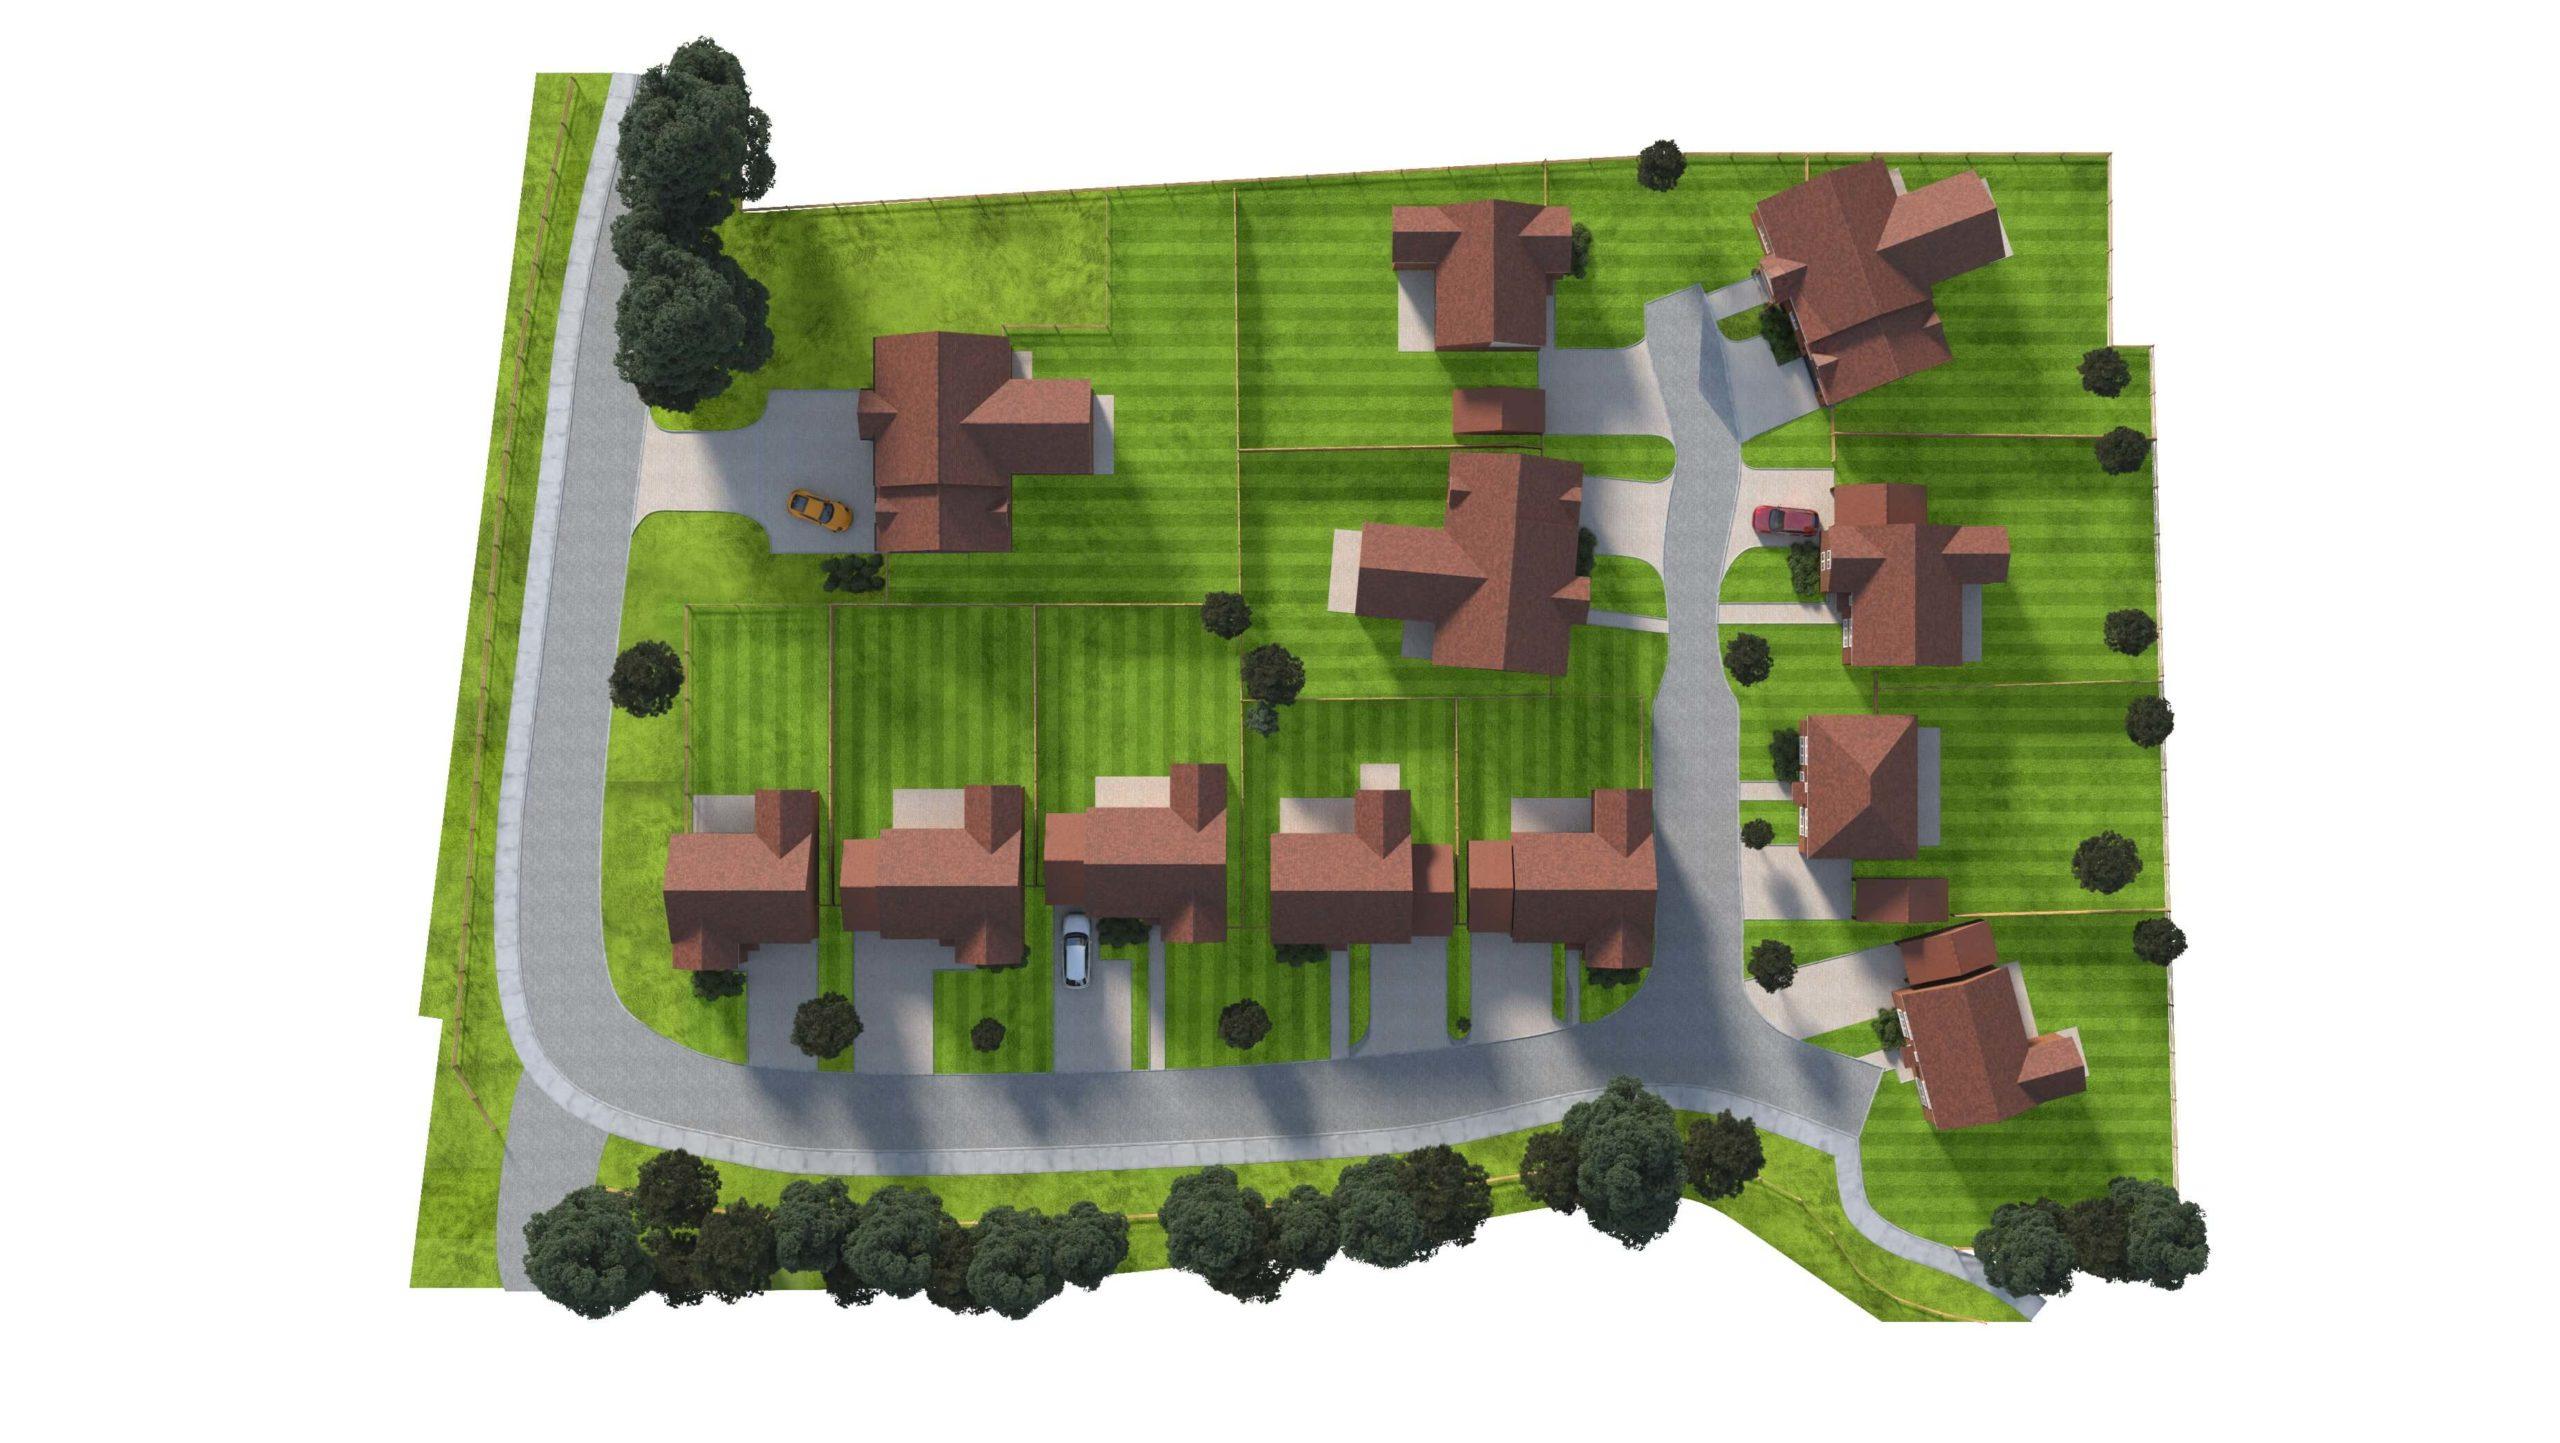 Langton Gardens Aerial View Plan